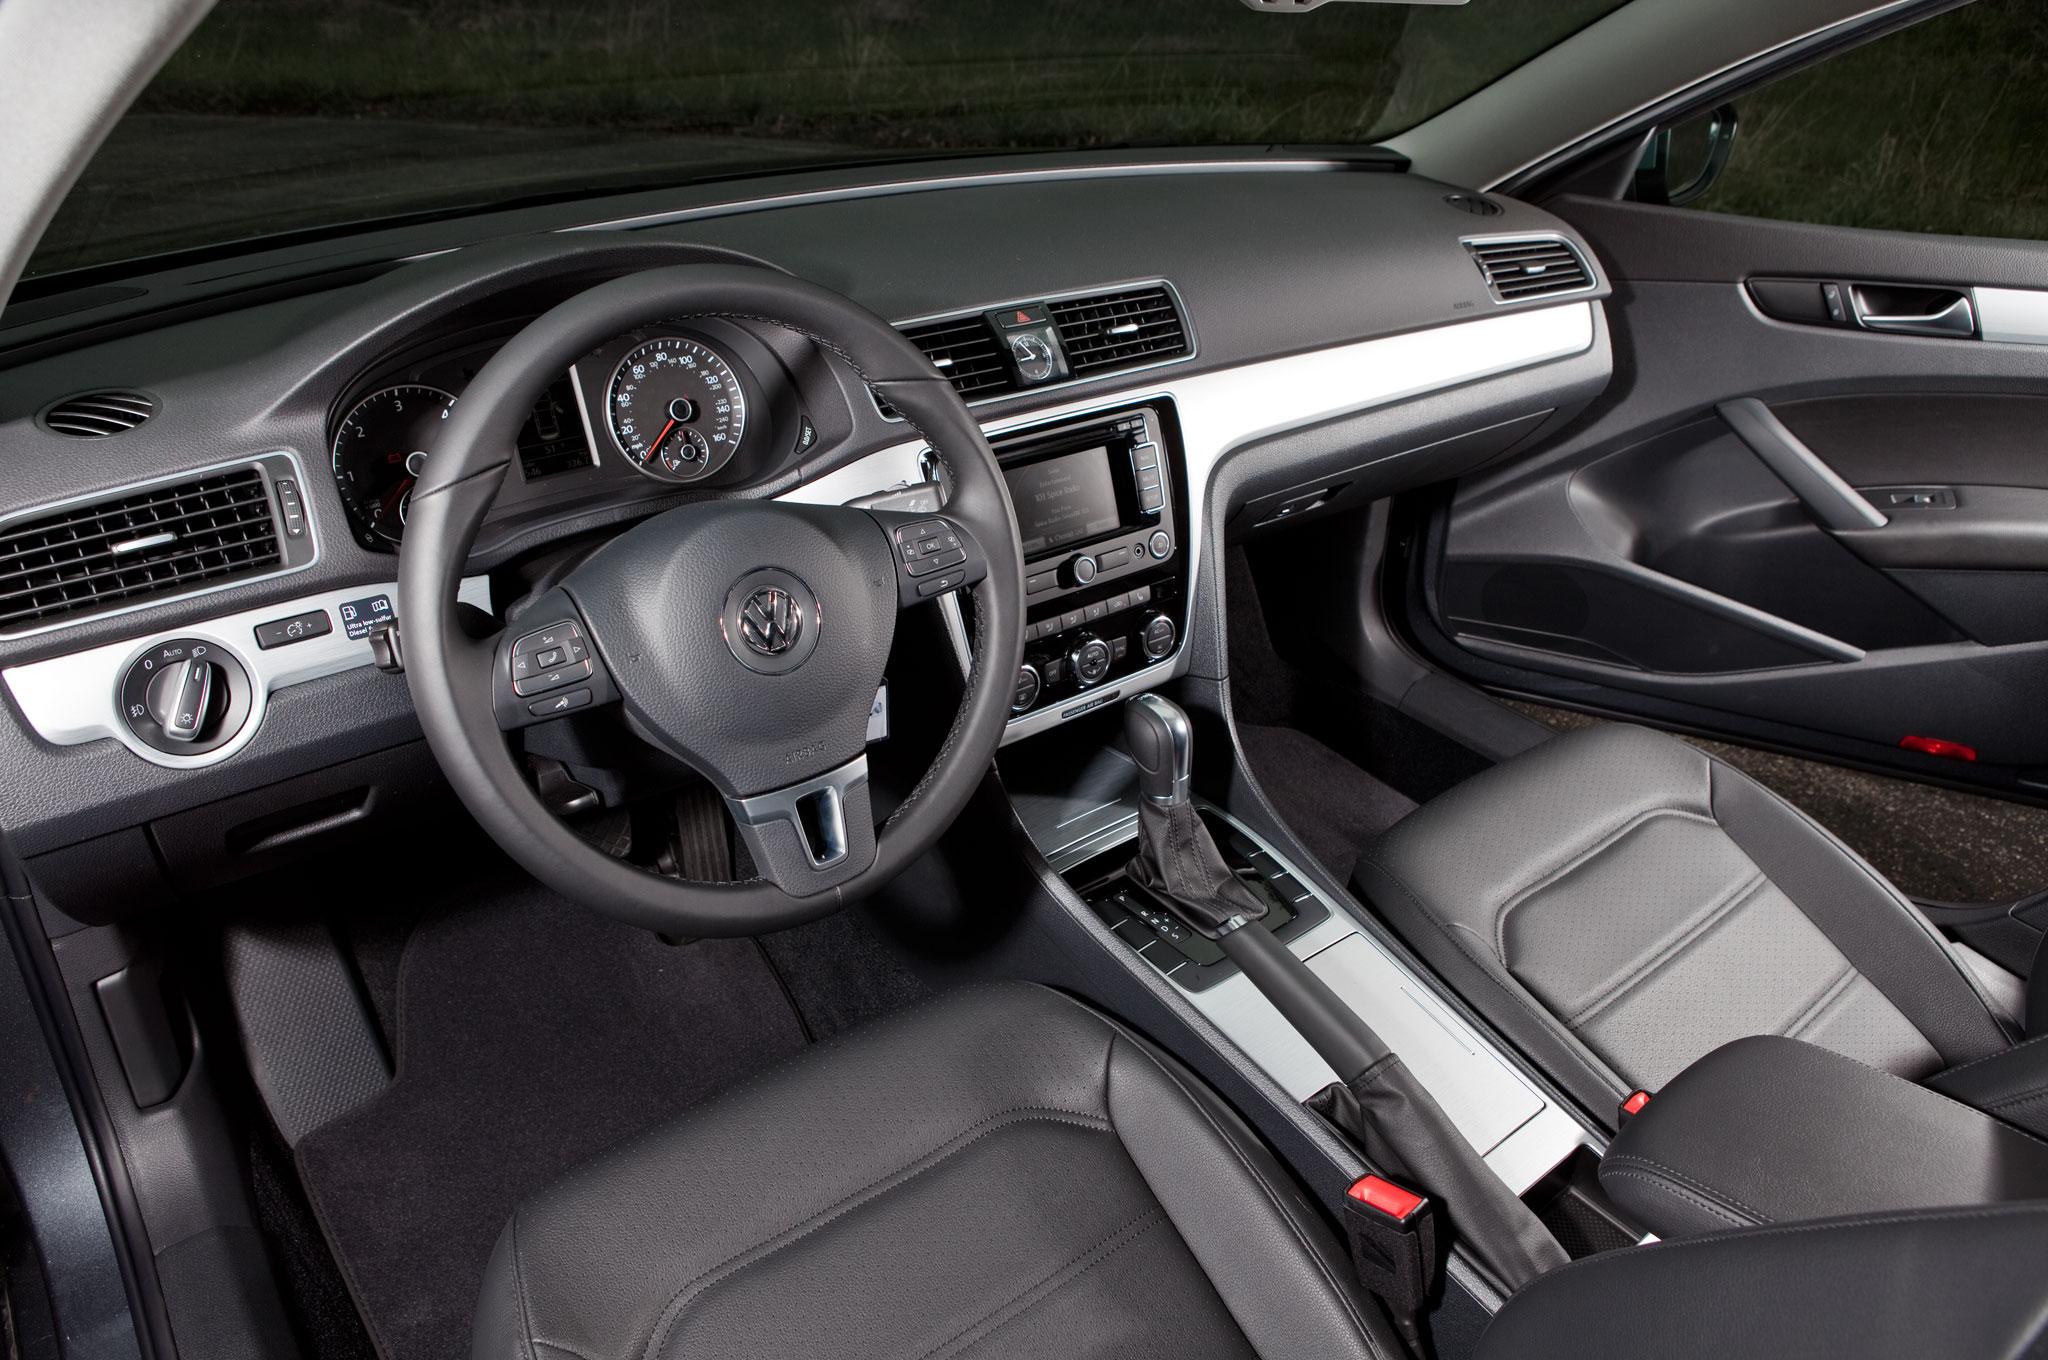 2012 volkswagen passat tdi four seasons wrap up automobile magazine rh automobilemag com Mazda 3 Manual Transmission 2013 vw passat manual transmission